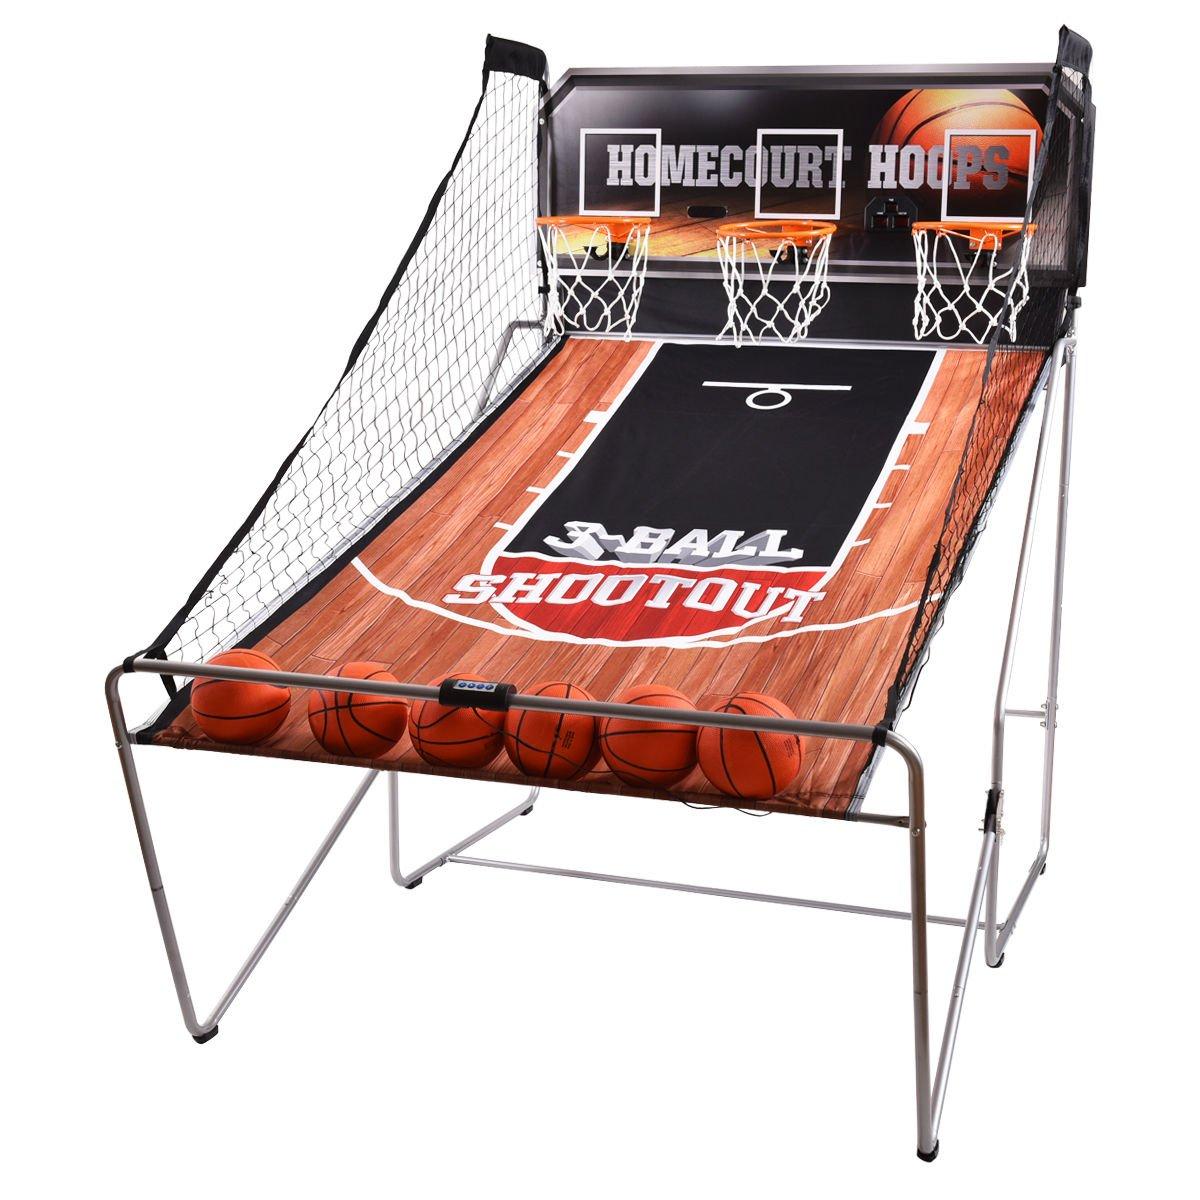 Electronic Basketball   Amazon.com: Leisure Sports & Game Room